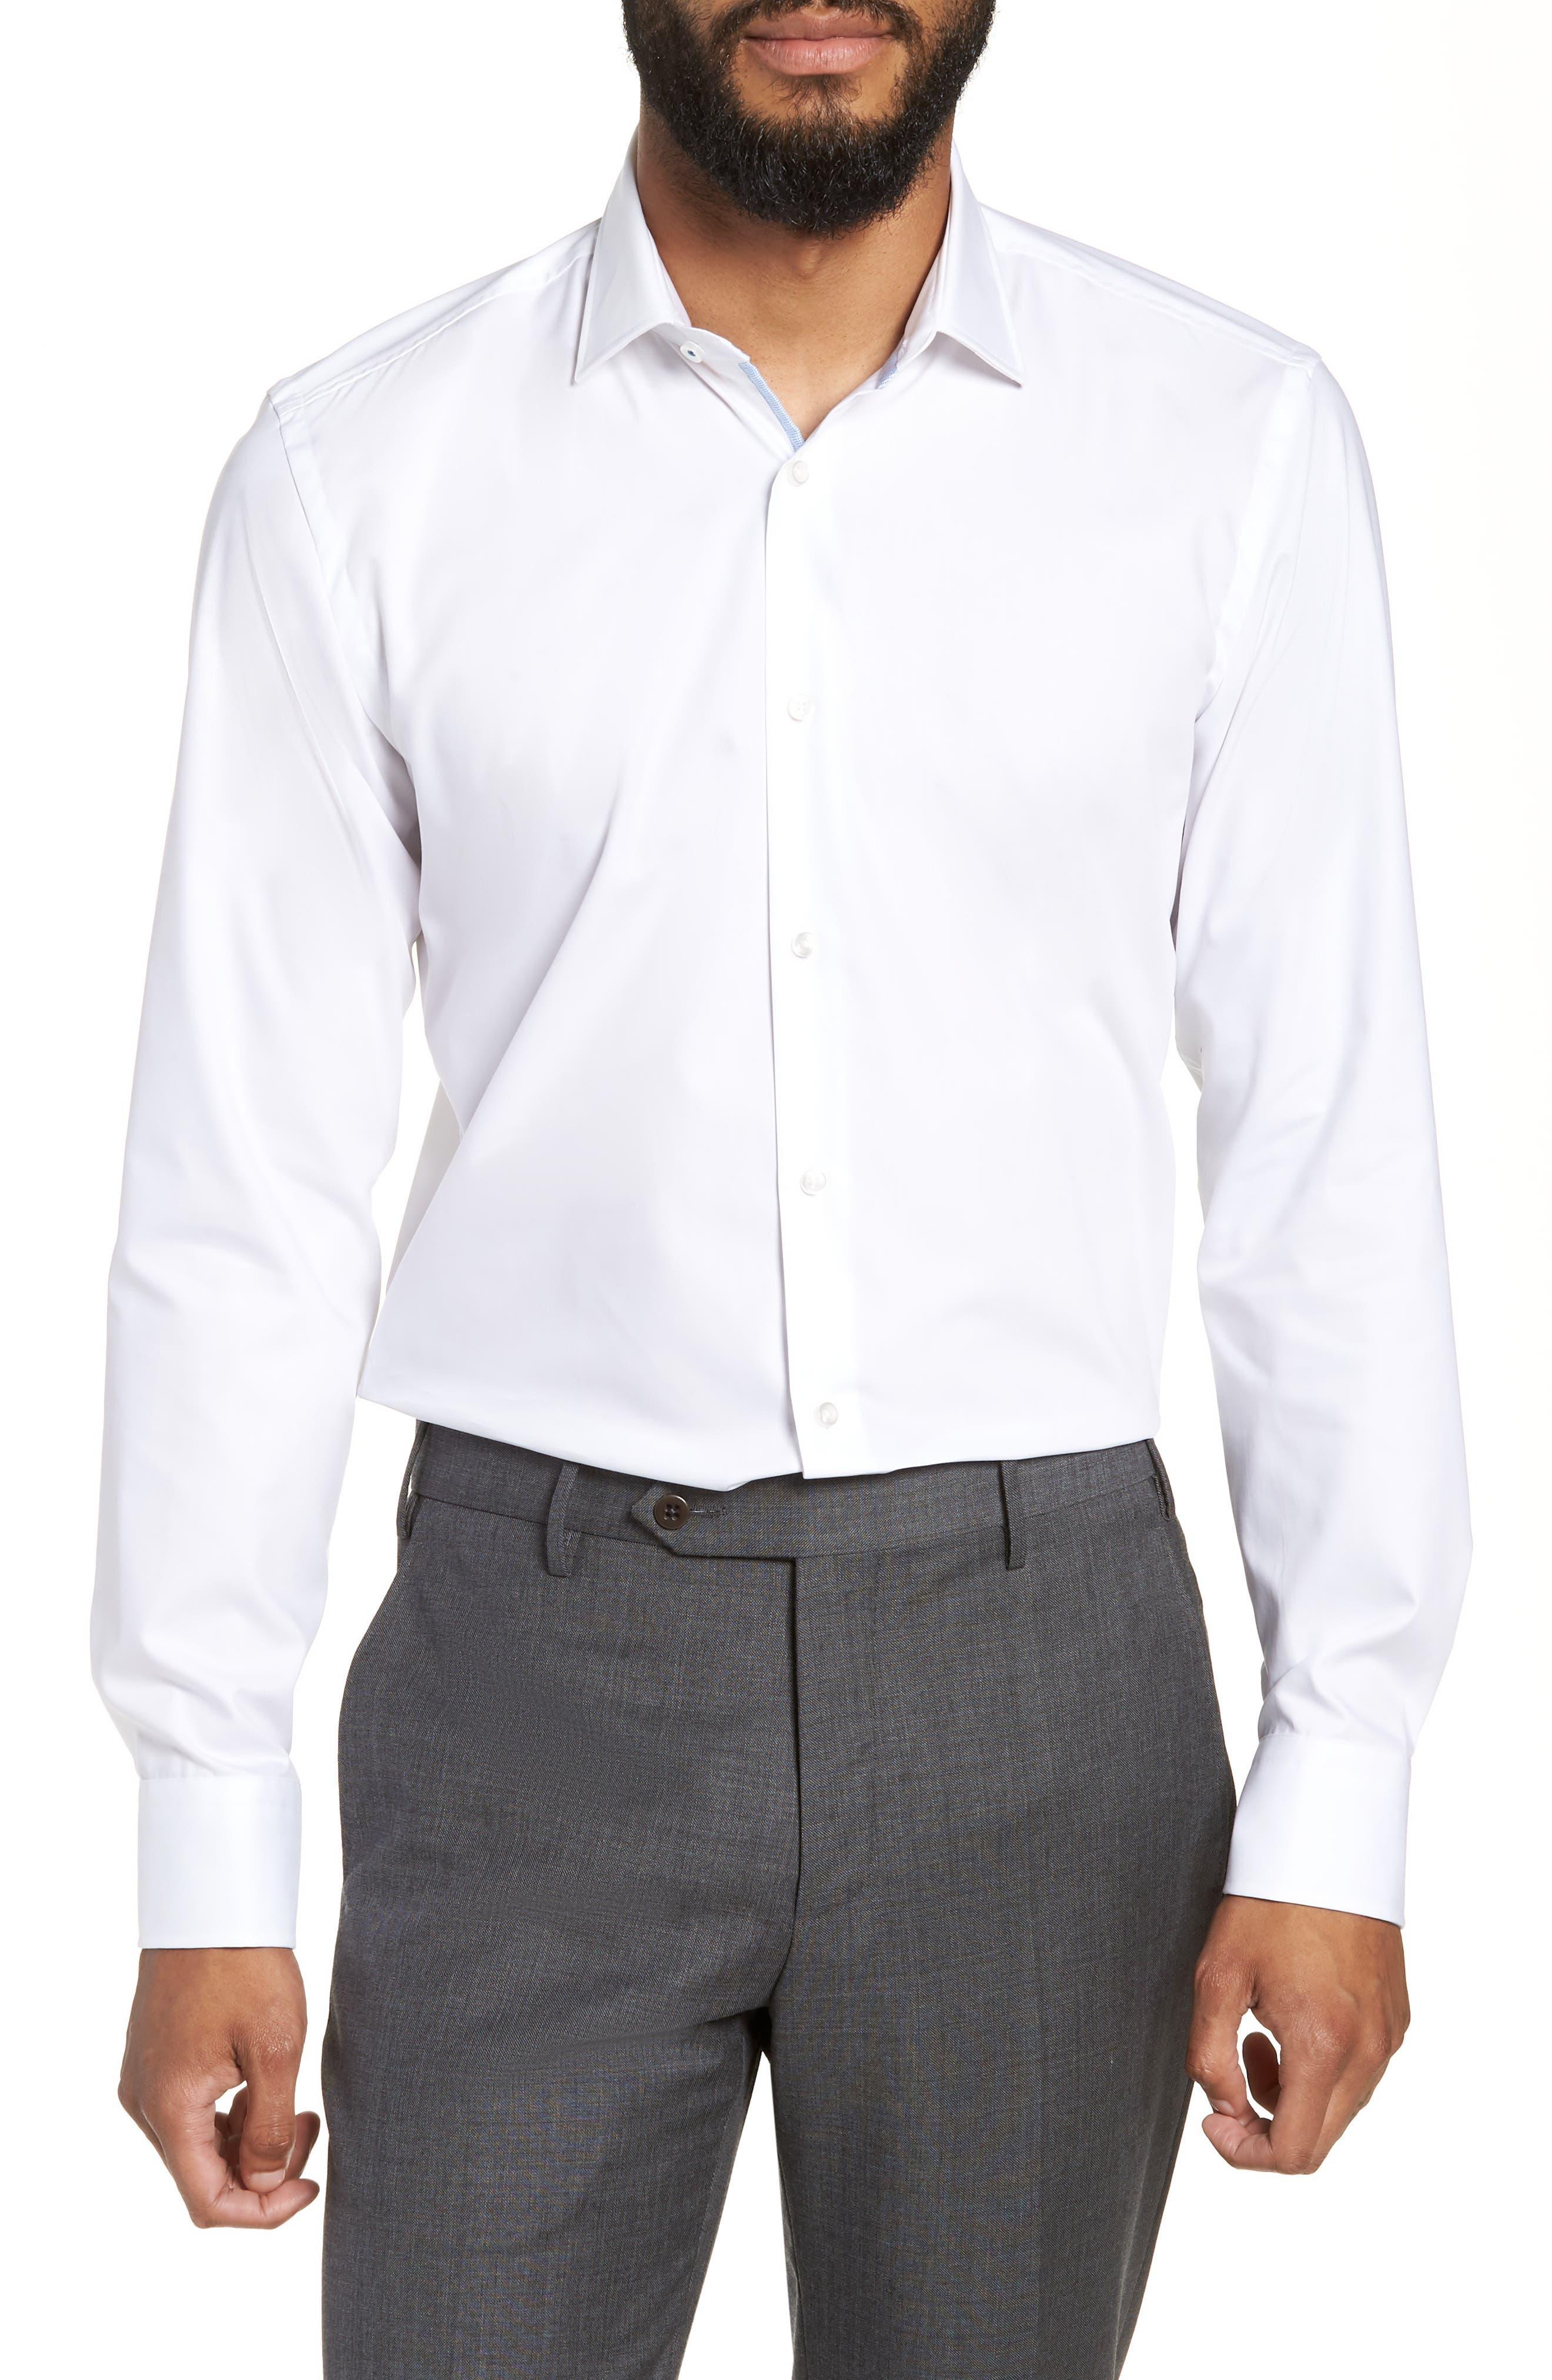 Jesse Slim Fit Easy Iron Dress Shirt,                             Main thumbnail 1, color,                             White